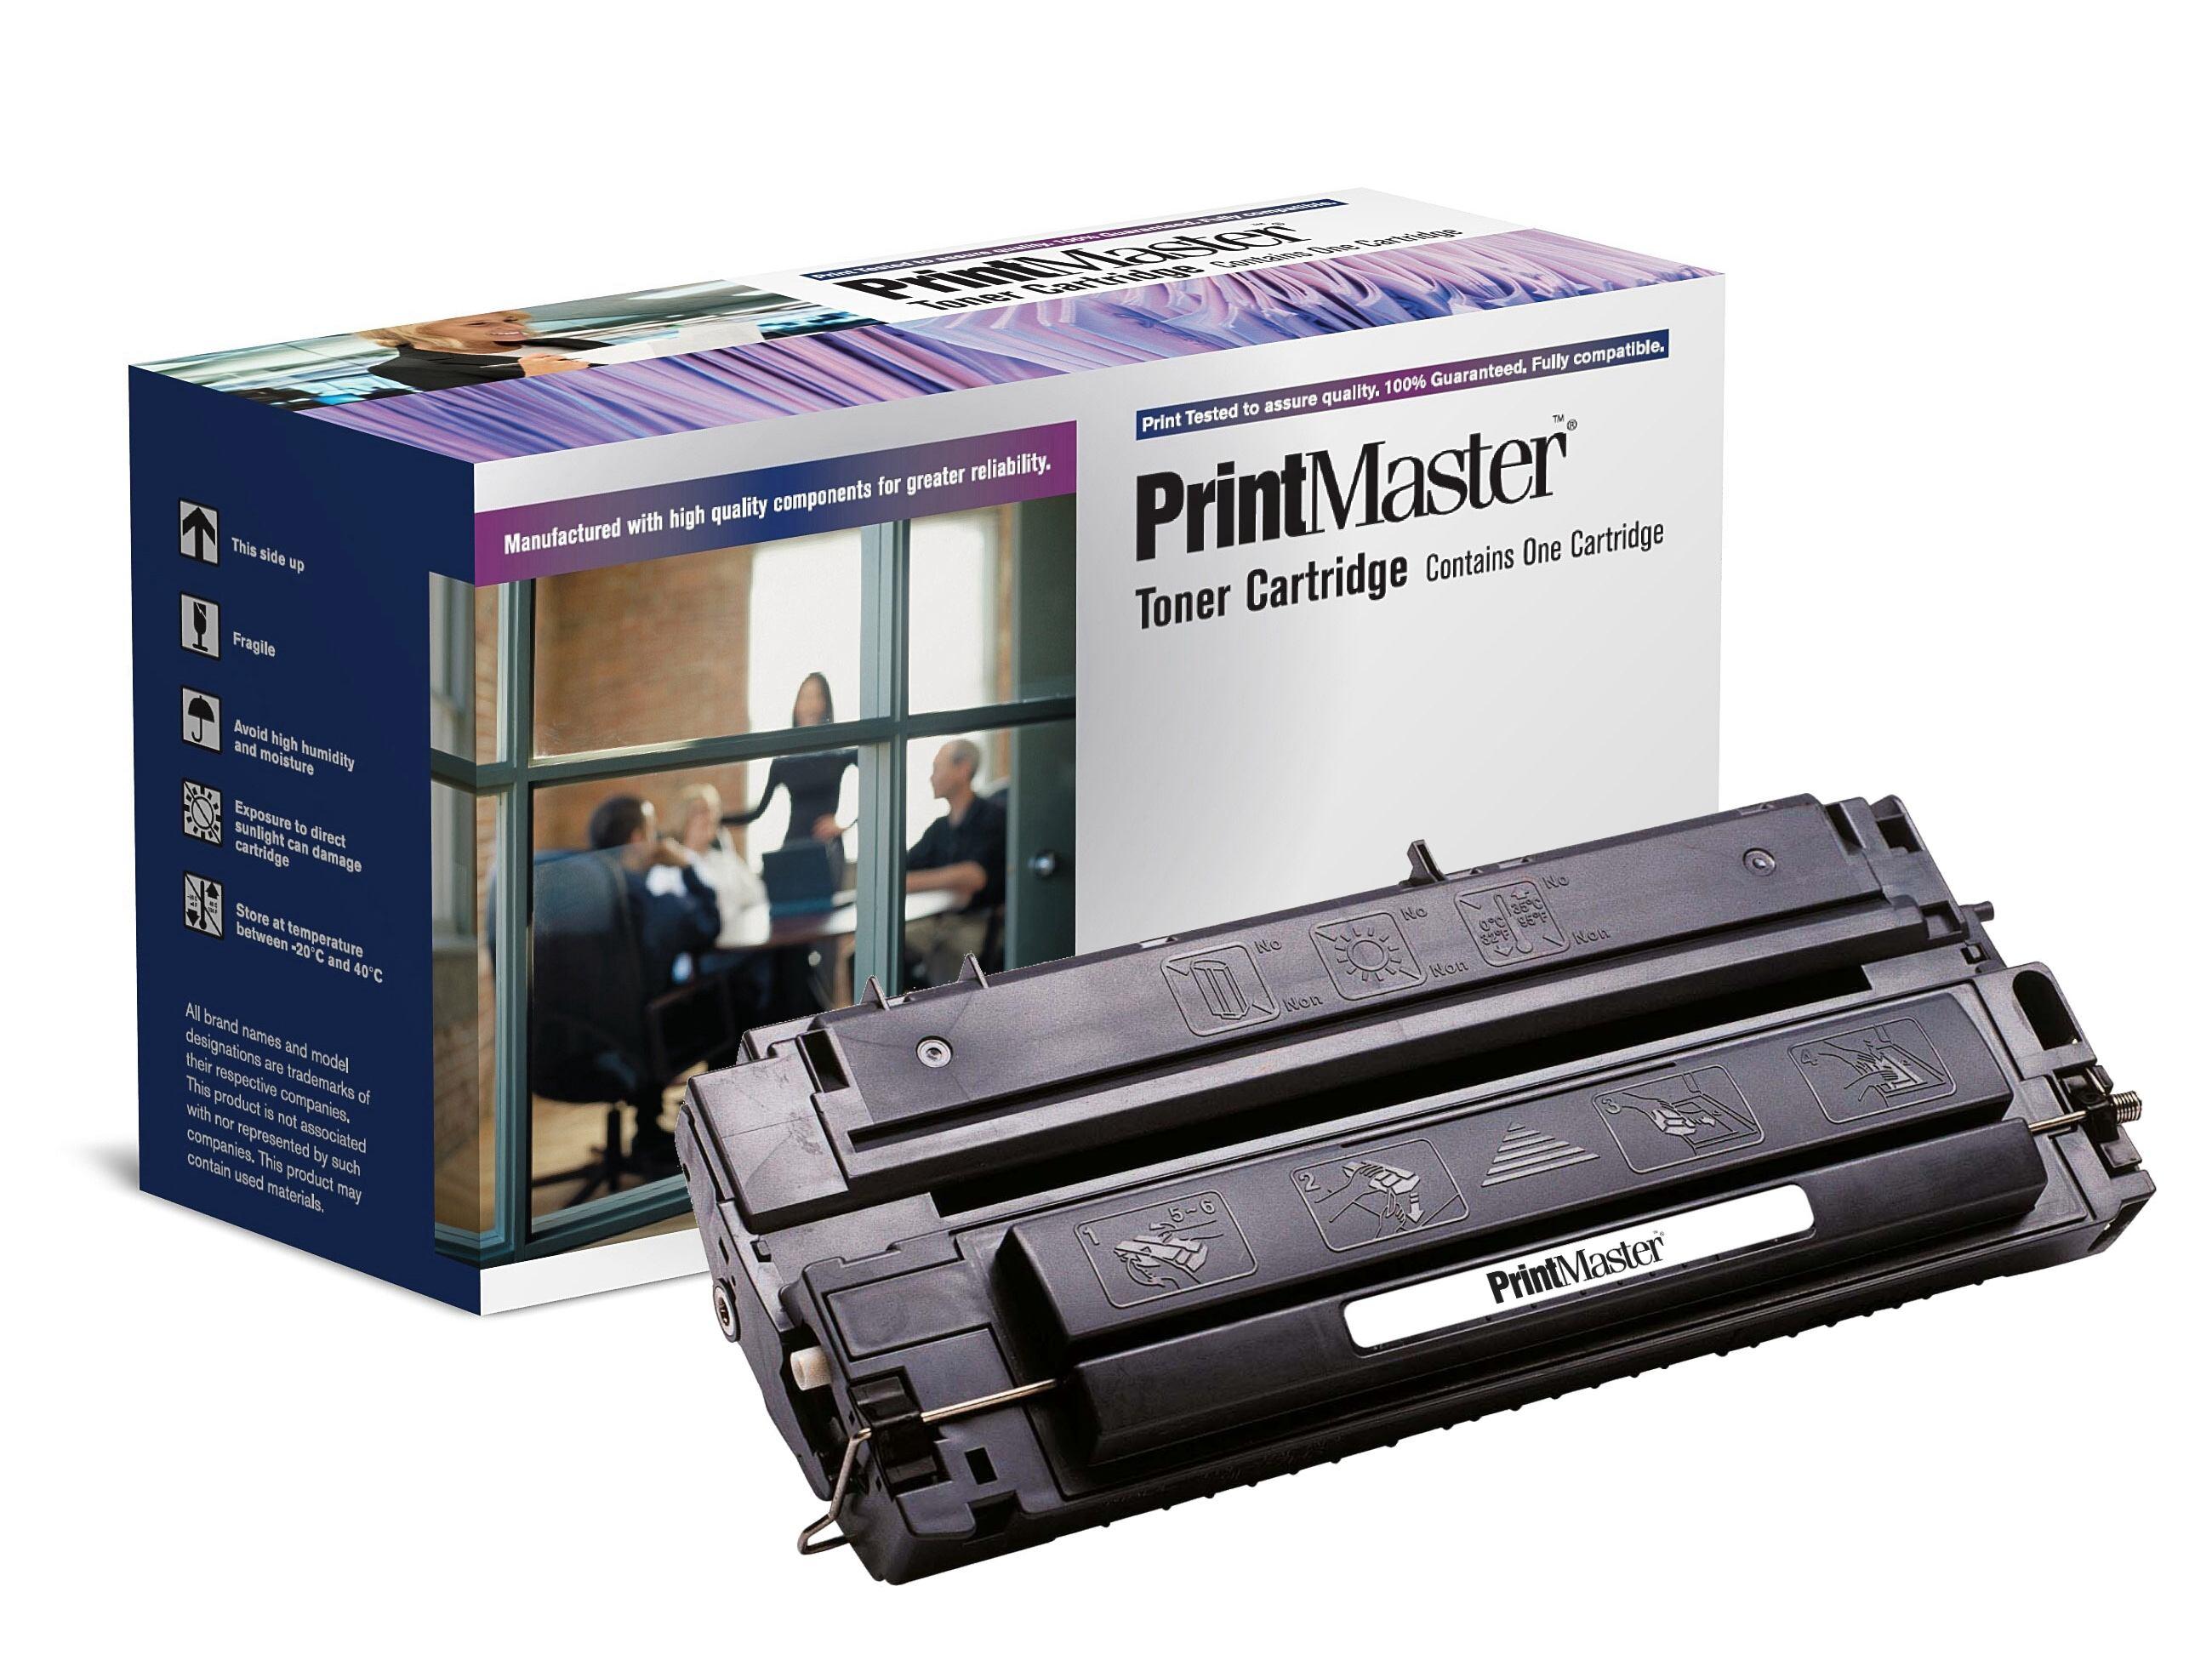 PrintMaster HP LaserJet 5P/5Mp C3903A